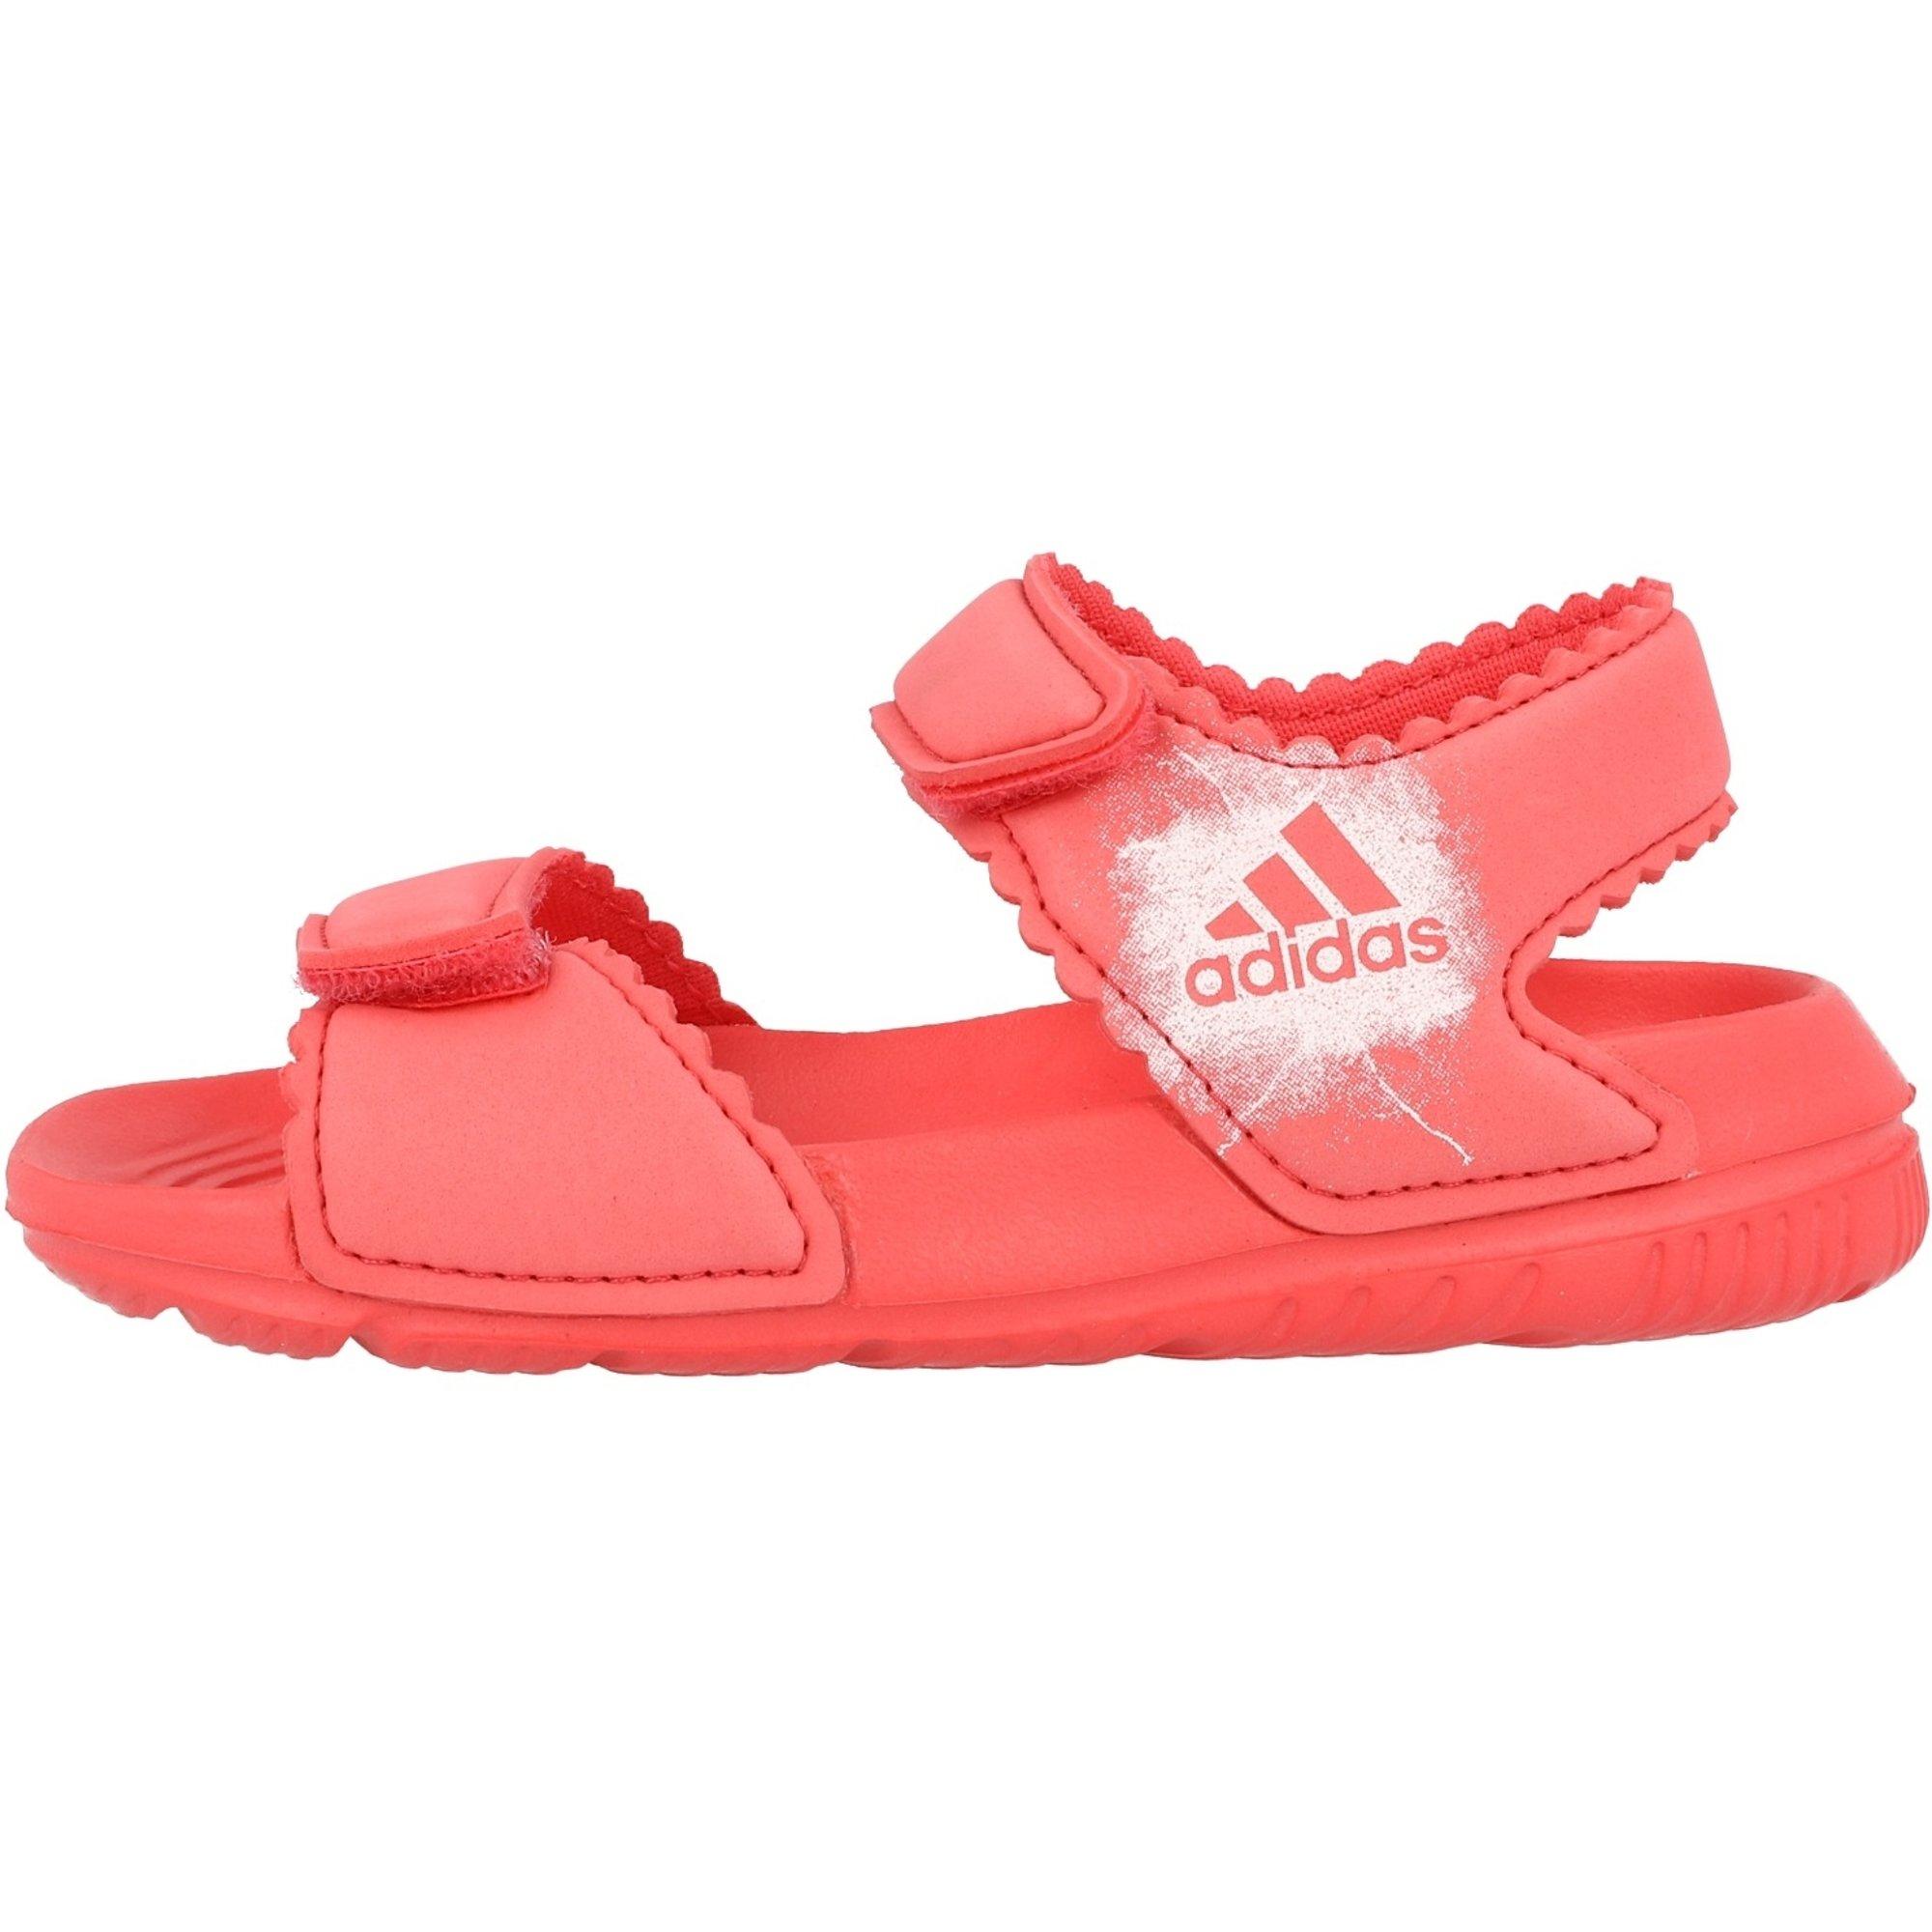 adidas AltaSwim g I Core Pink Synthetic Baby